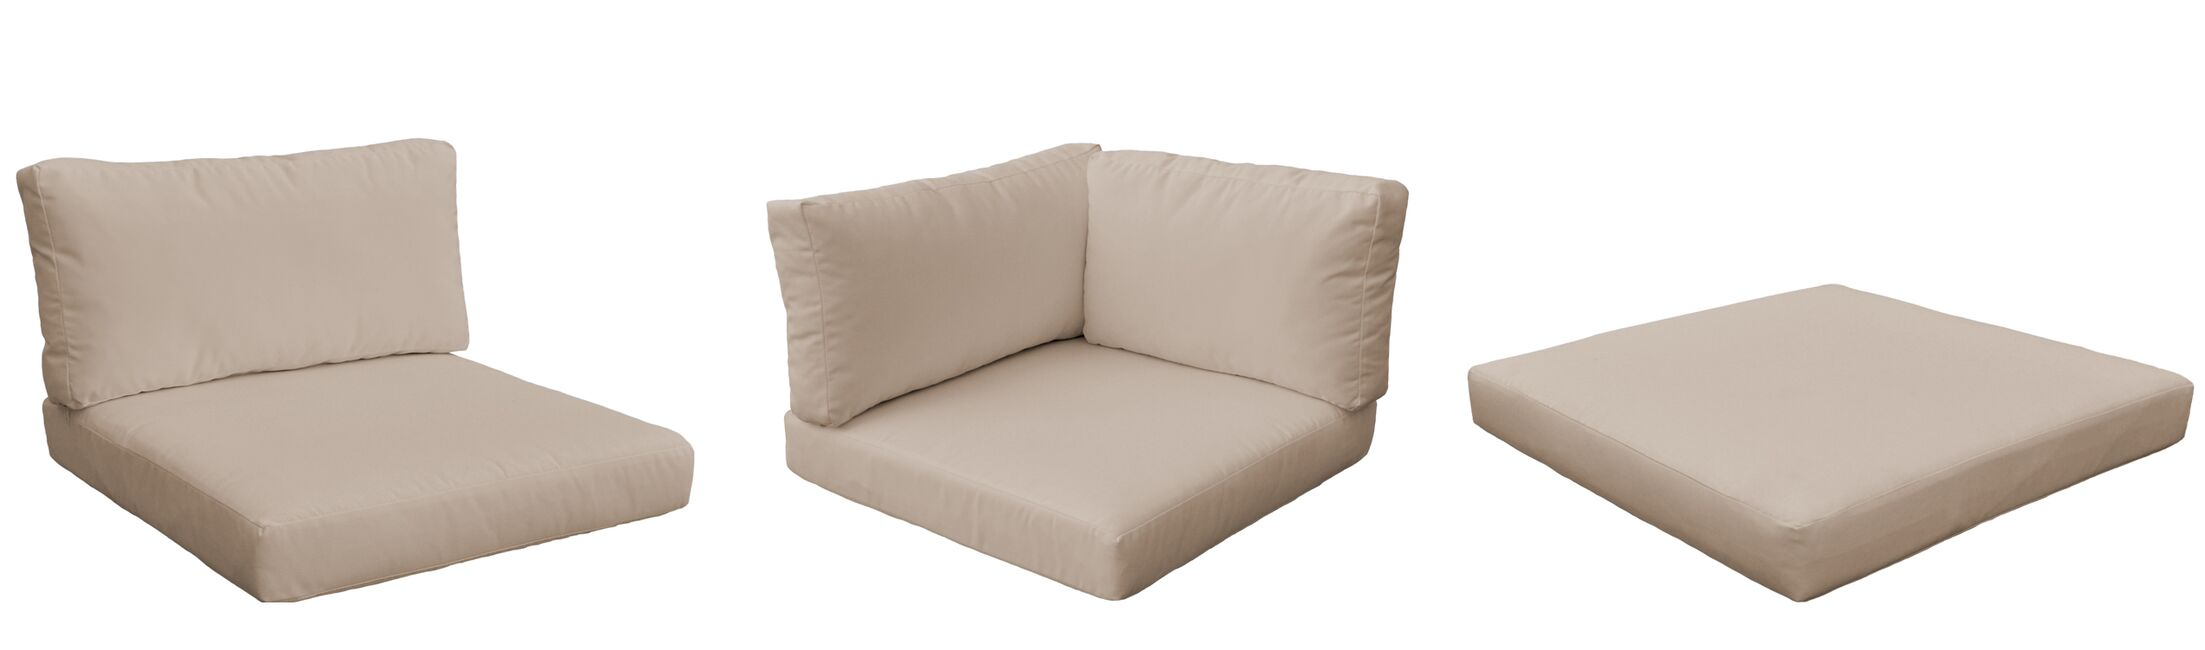 Monterey Outdoor 23 Piece Lounge Chair Cushion Set Fabric: Wheat